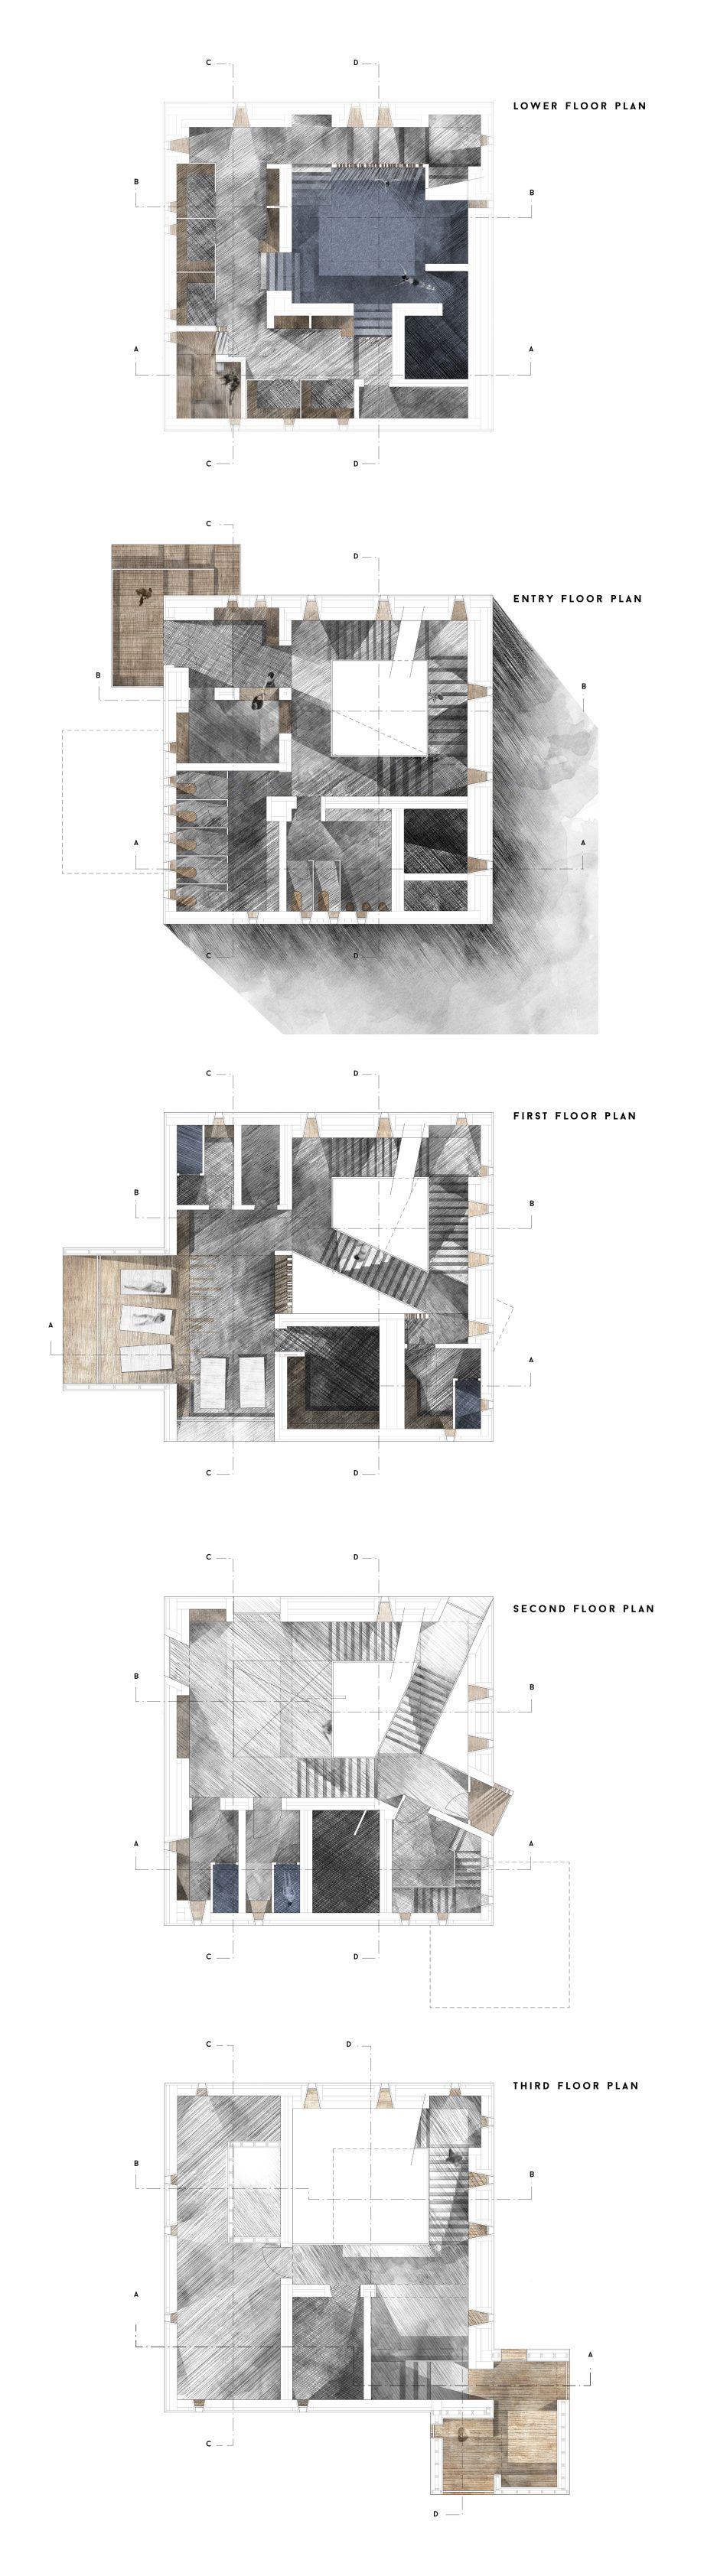 floor plans alex kindlen final studio project architectural floor plans alex kindlen final studio project